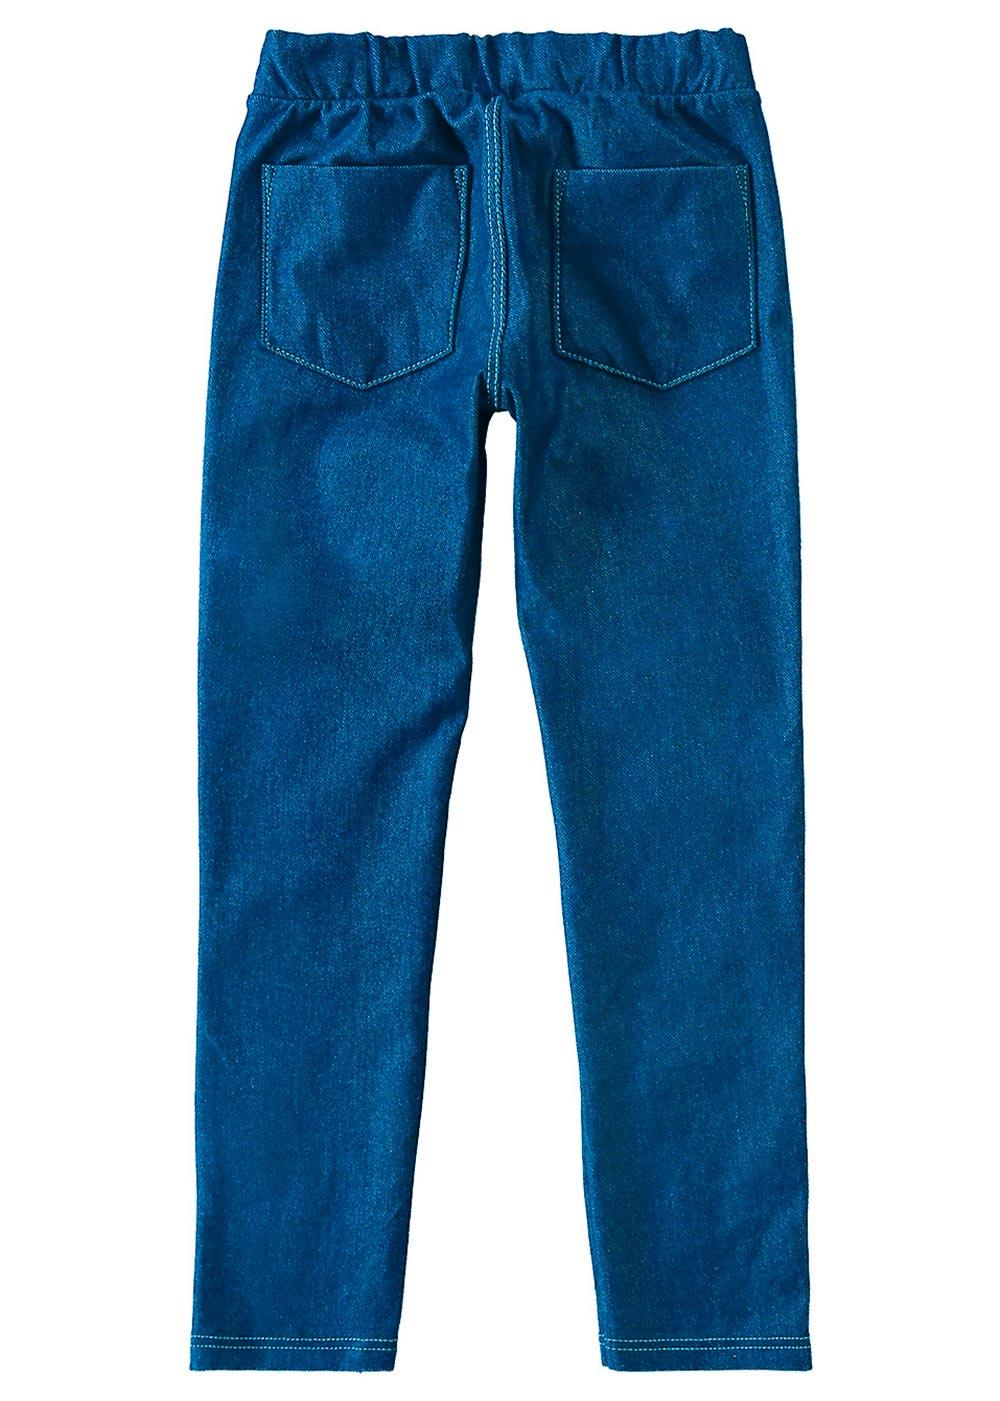 Legging Infantil Inverno Jeans Claro Azul - Malwee